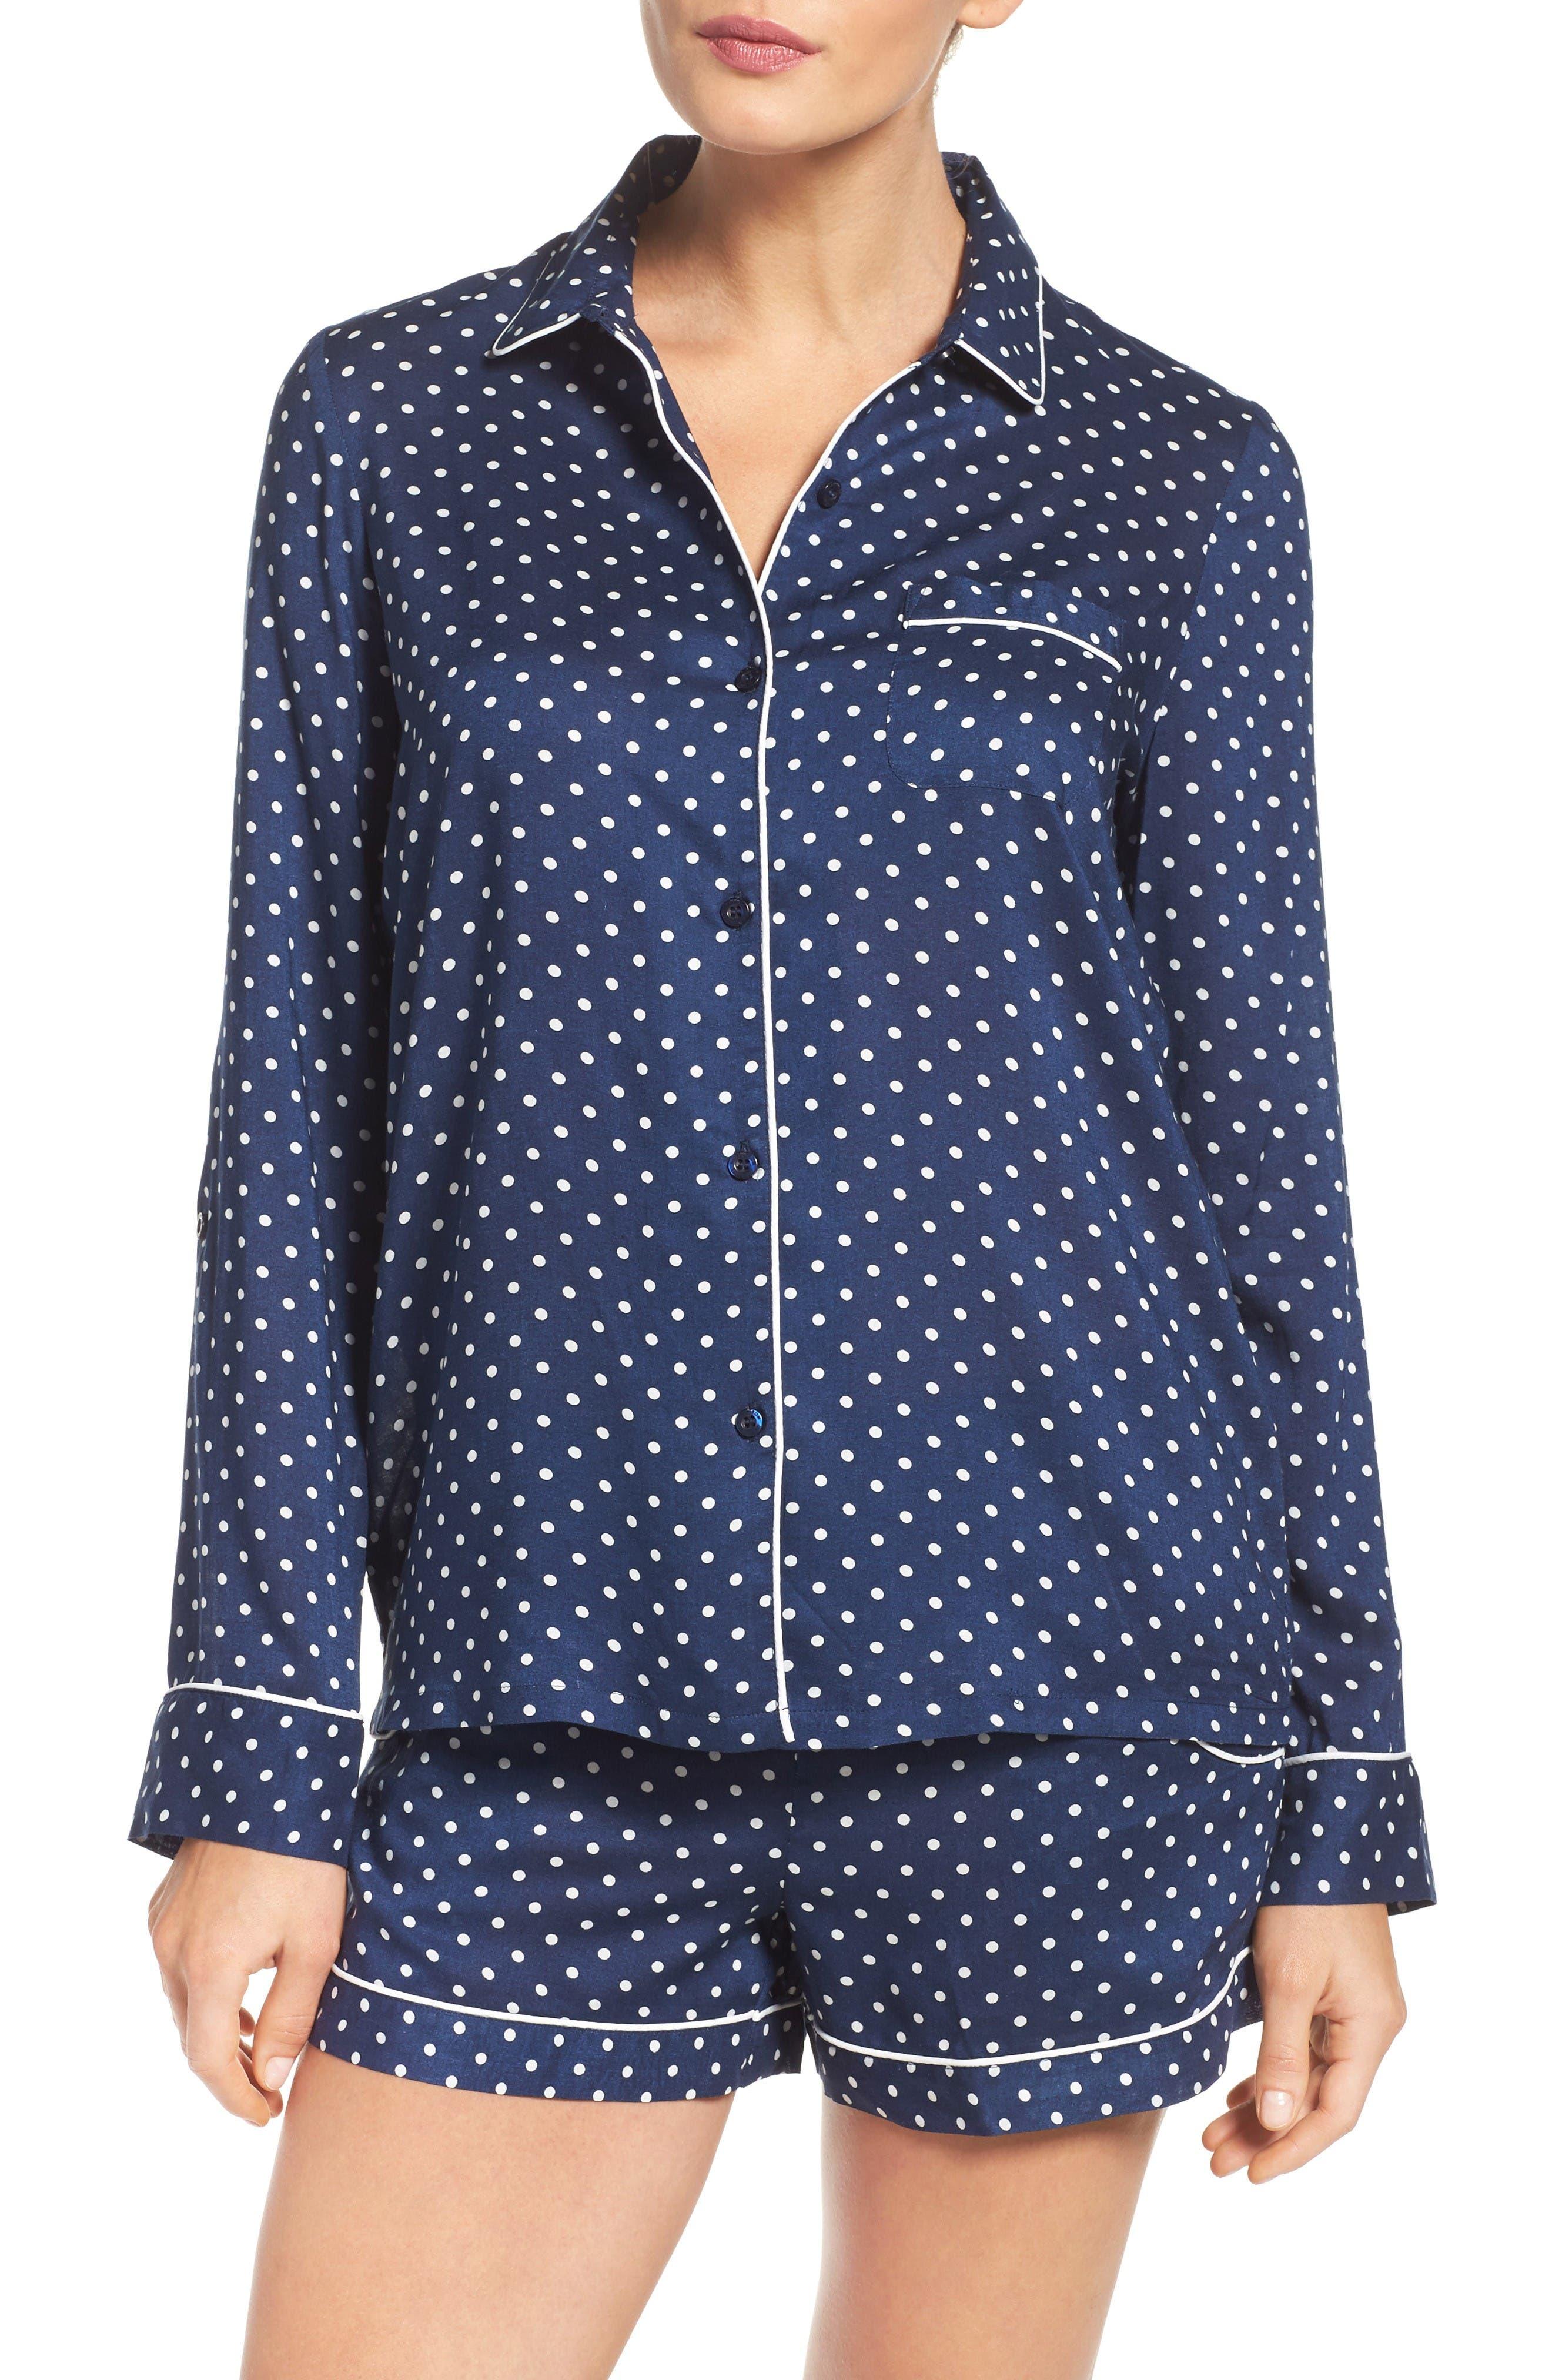 Main Image - Nordstrom Lingerie Woven Short Pajamas